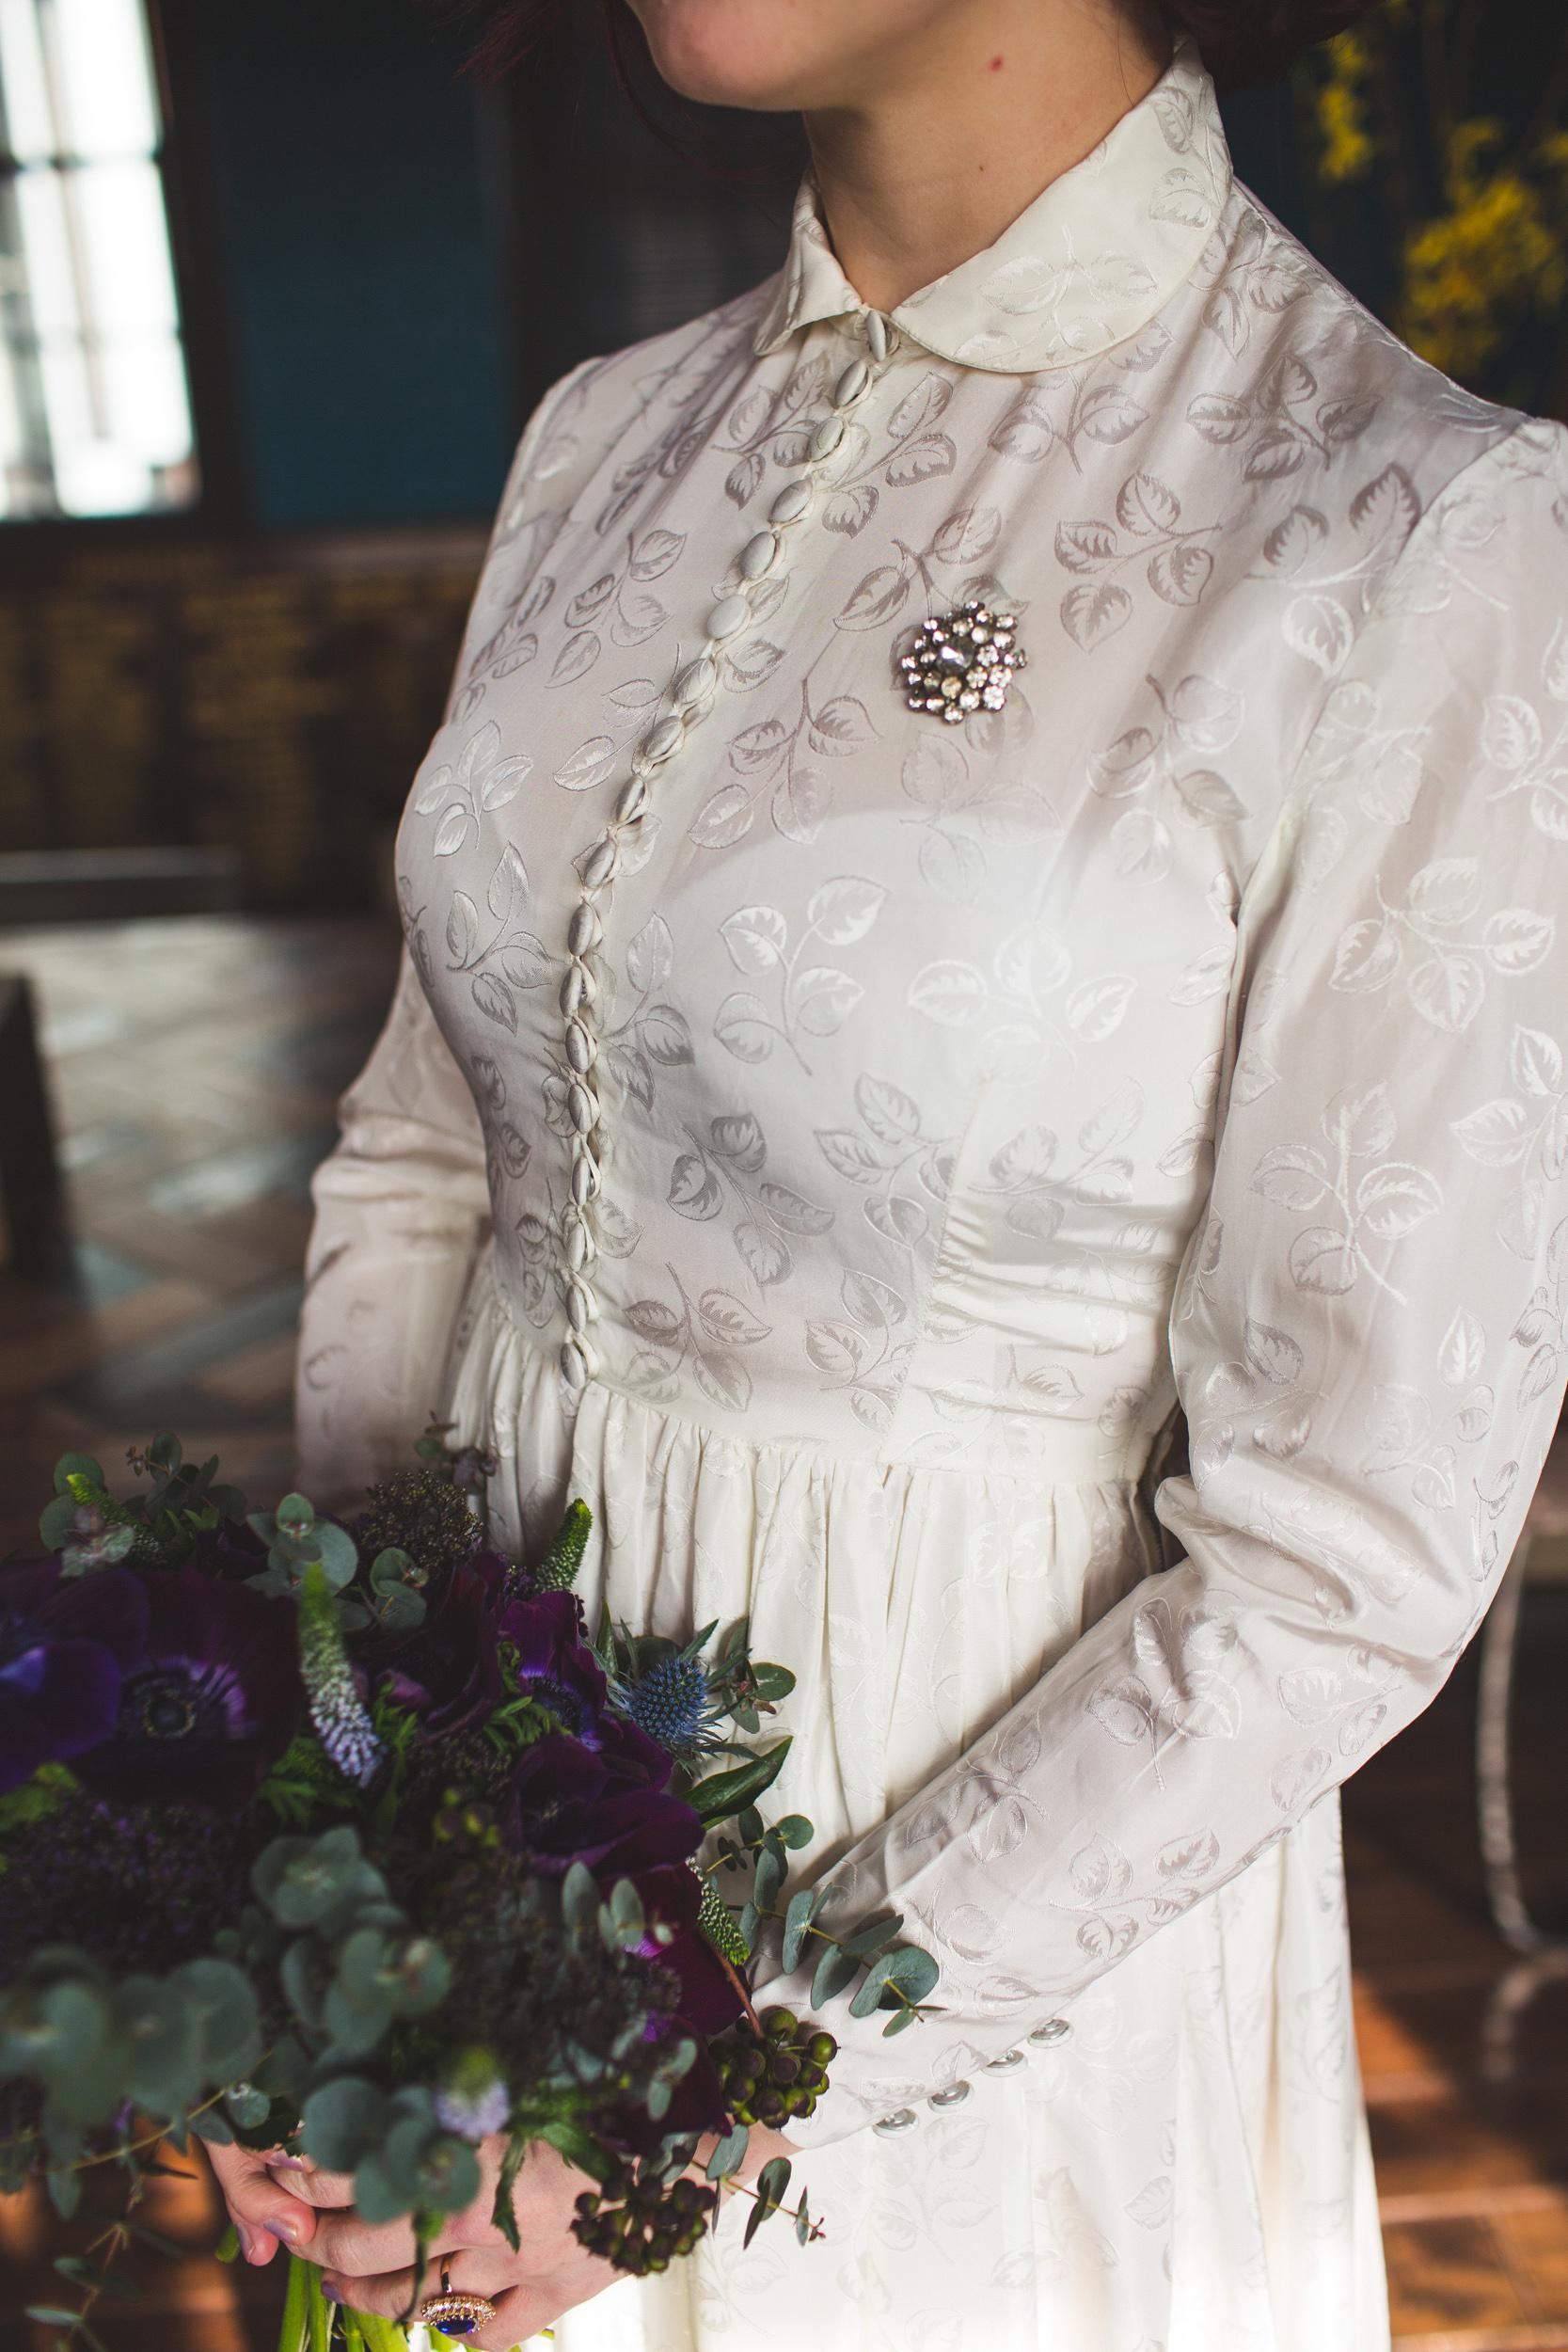 kate-beaumont-vintage-bridal-wedding-dresses-Sheffield-S6-9.jpg